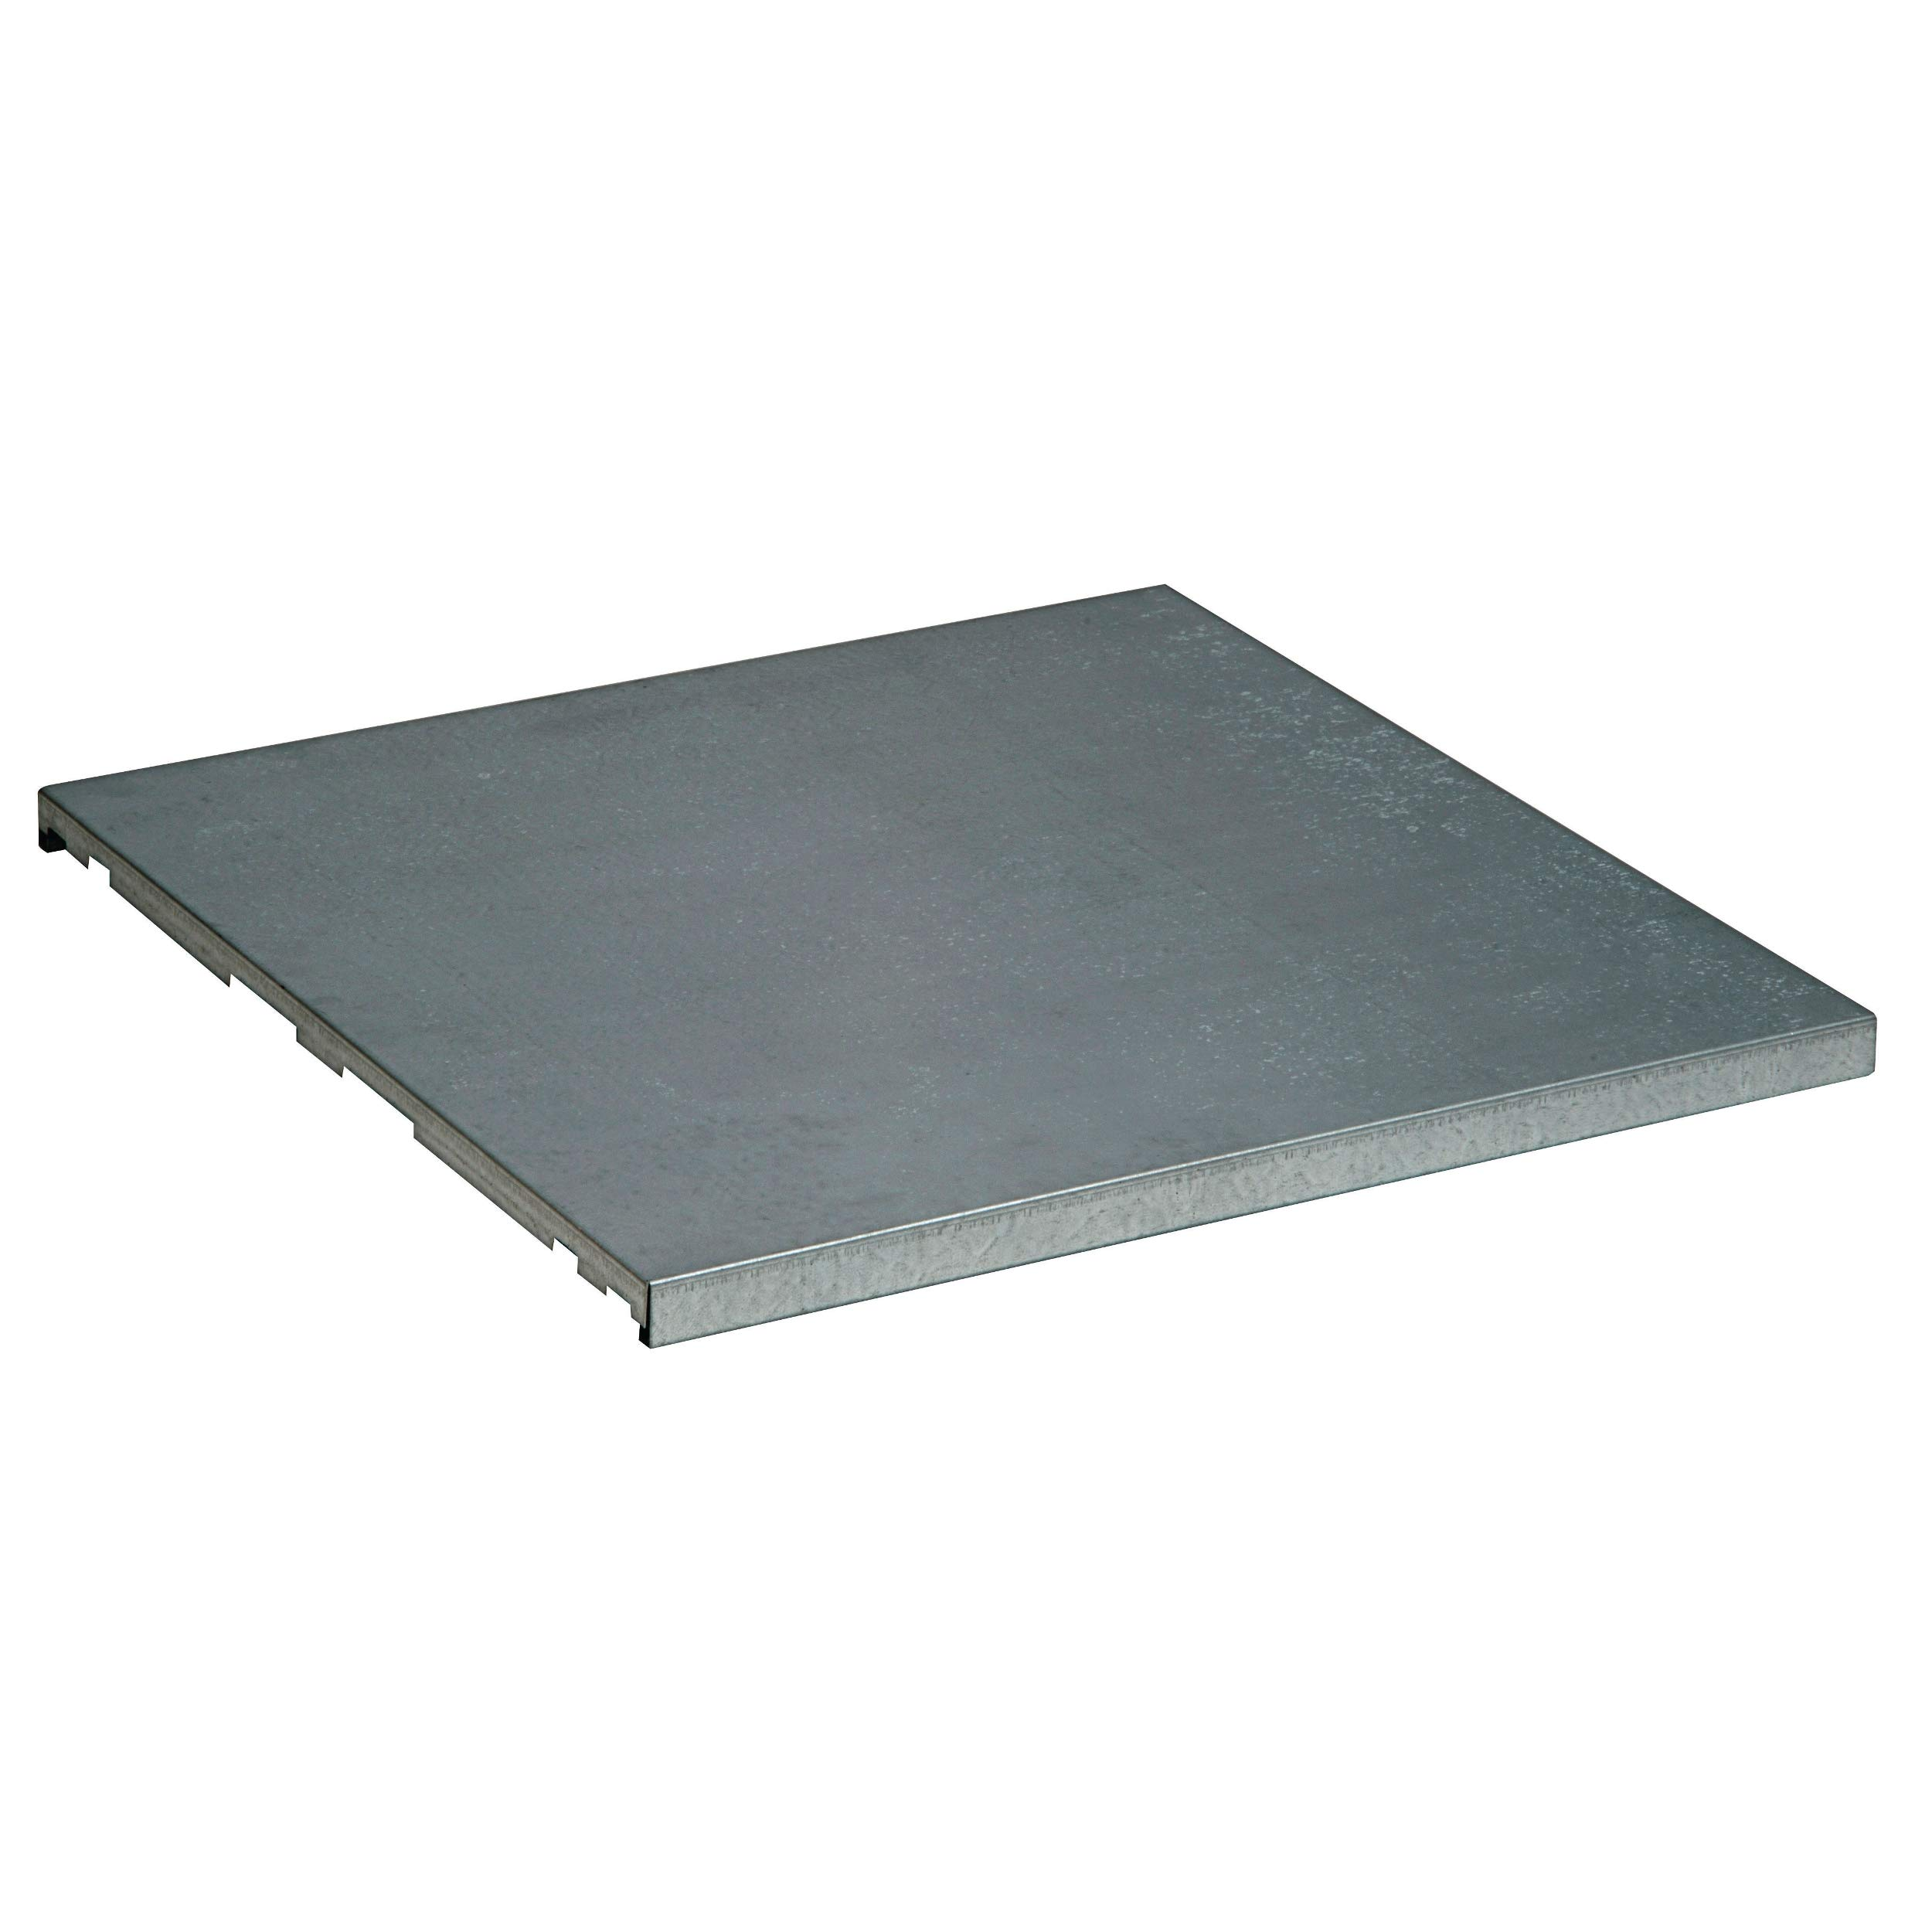 Justrite 29935-MOQ2 SpillSlope Shelf for 4 Gal Cabinet